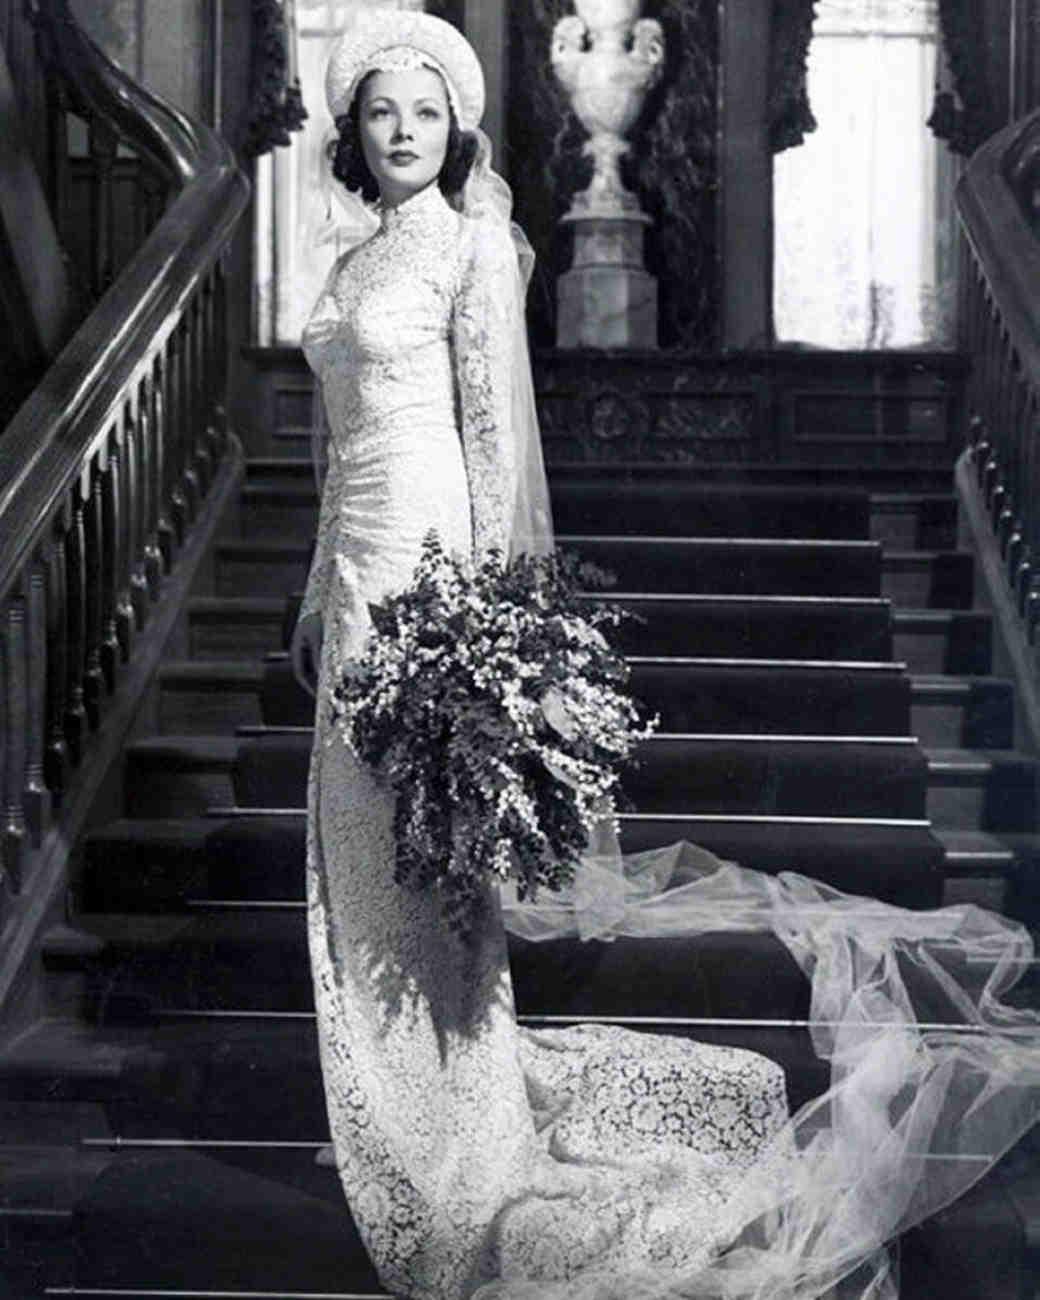 movie-wedding-dresses-the-razors-edge-gene-tierney-0516.jpg